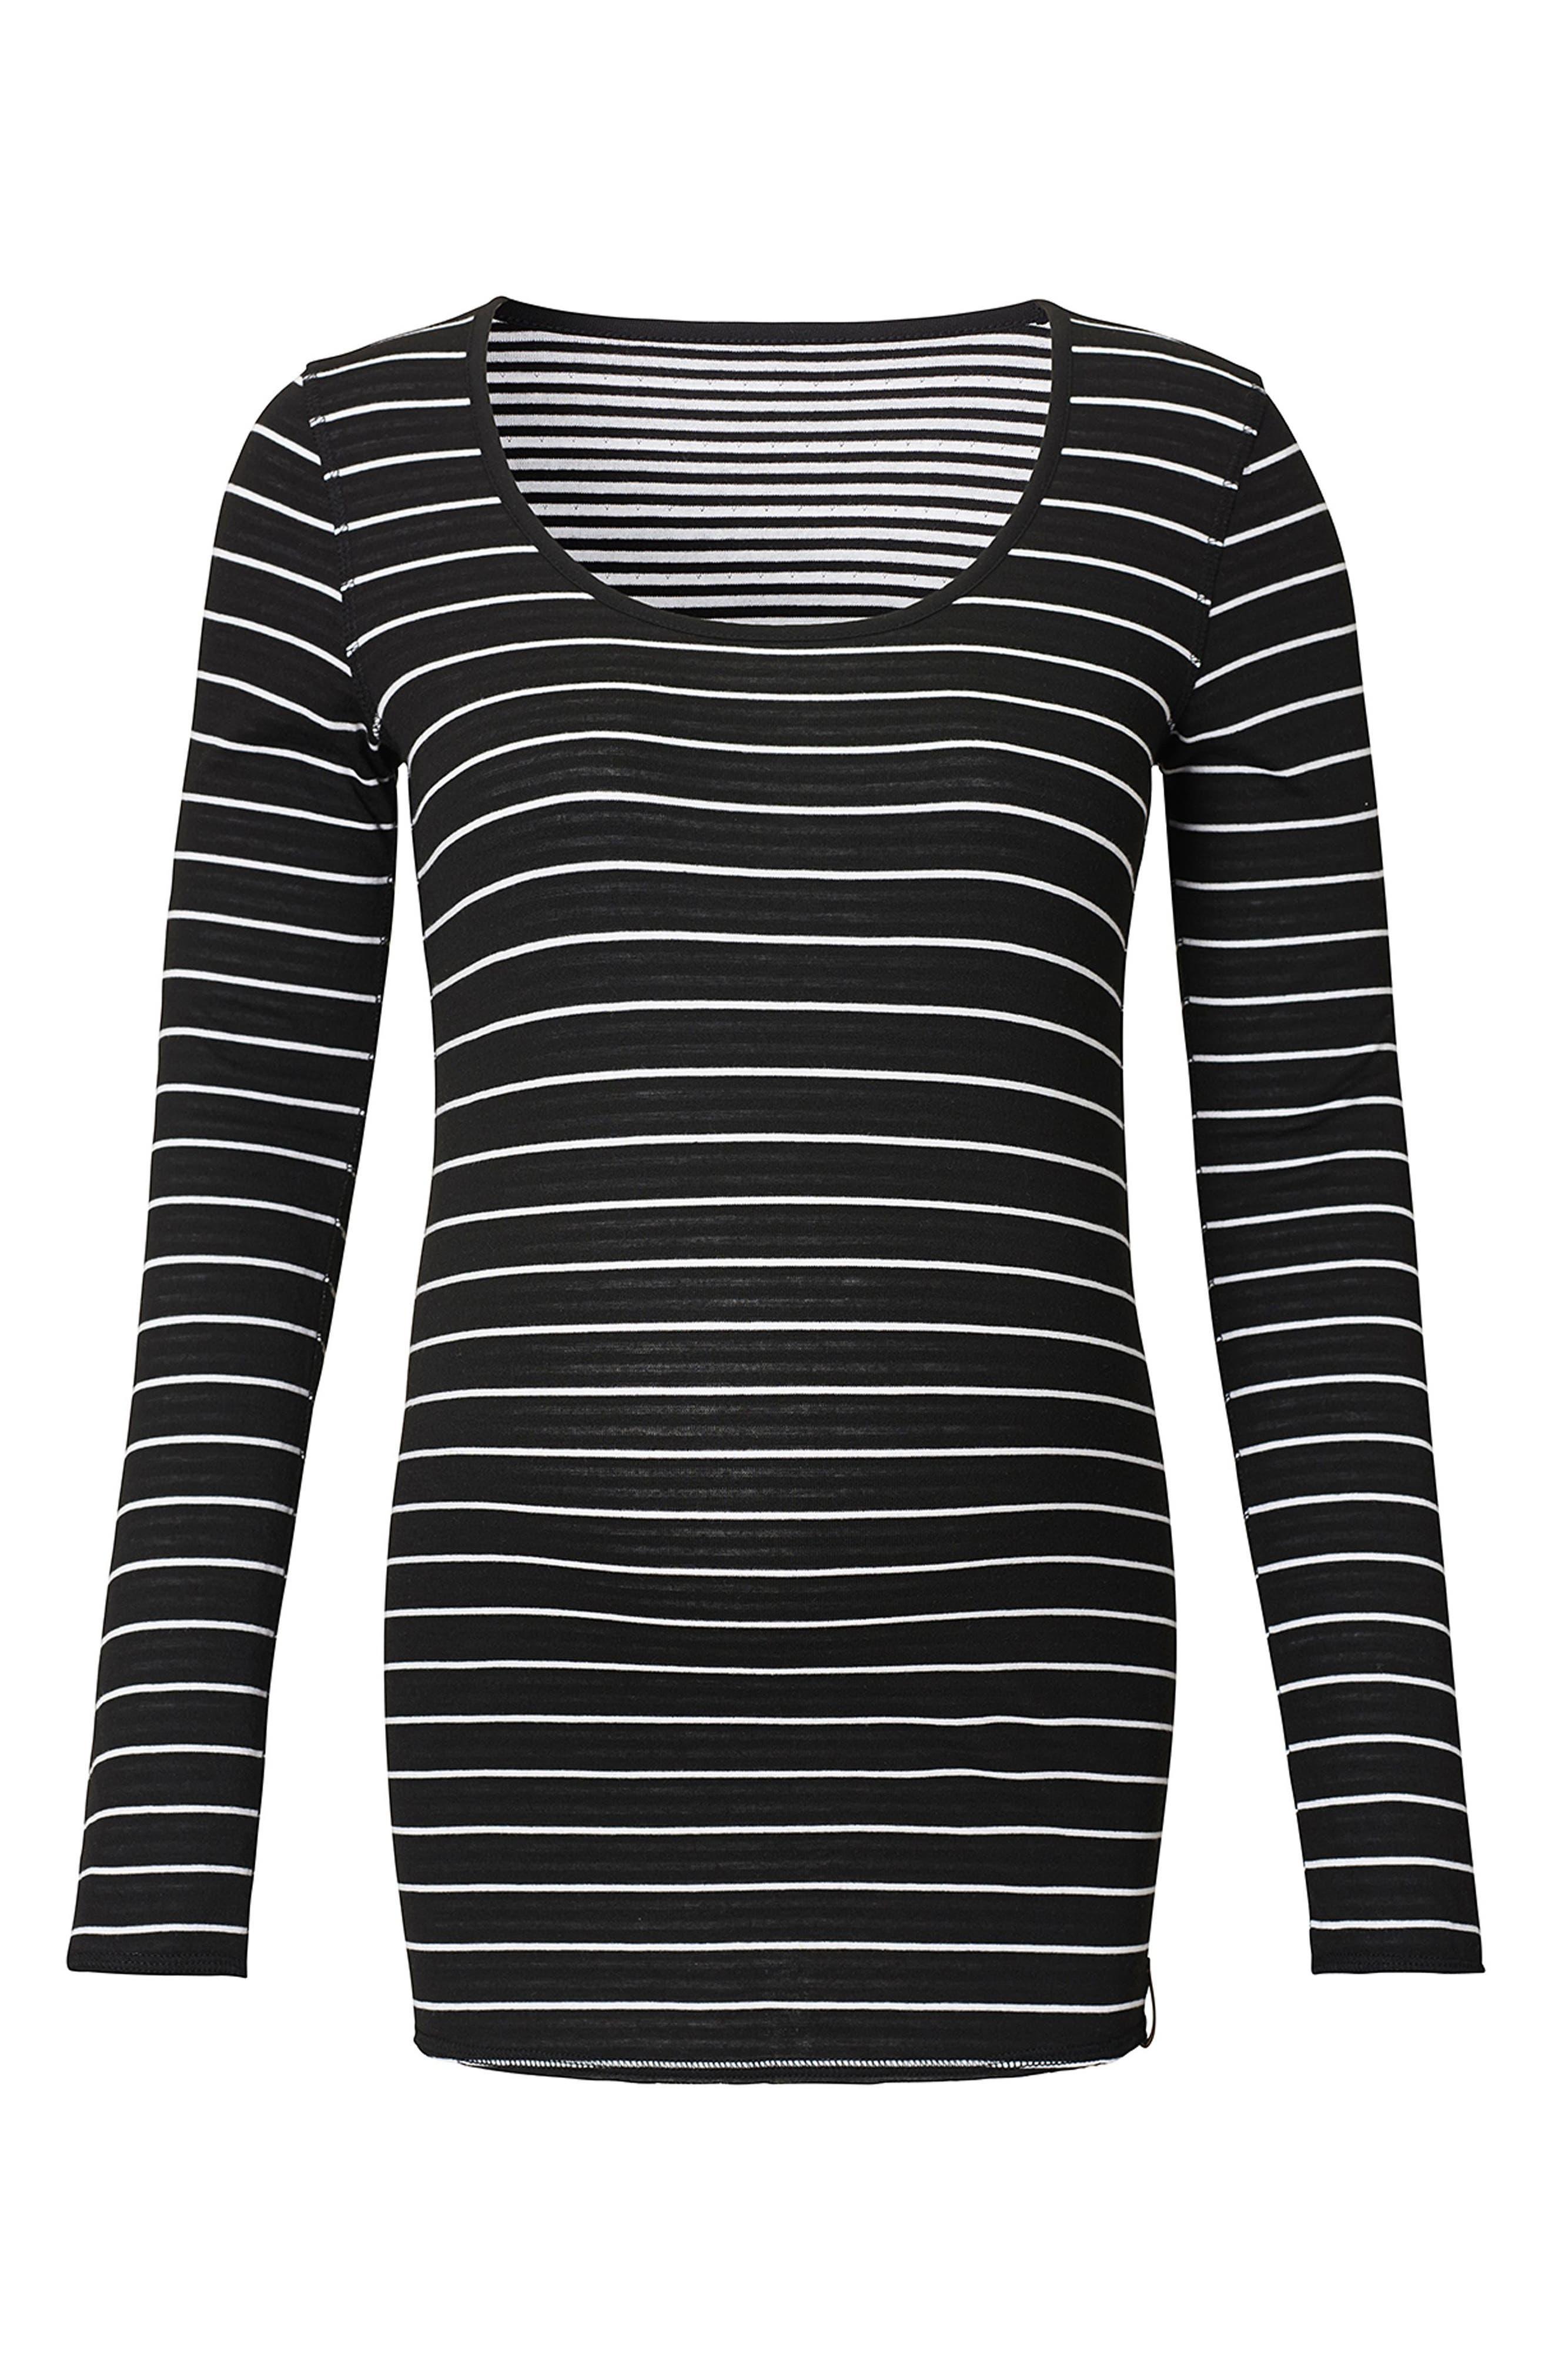 Main Image - Noppies Ivy Stripe Maternity Shirt